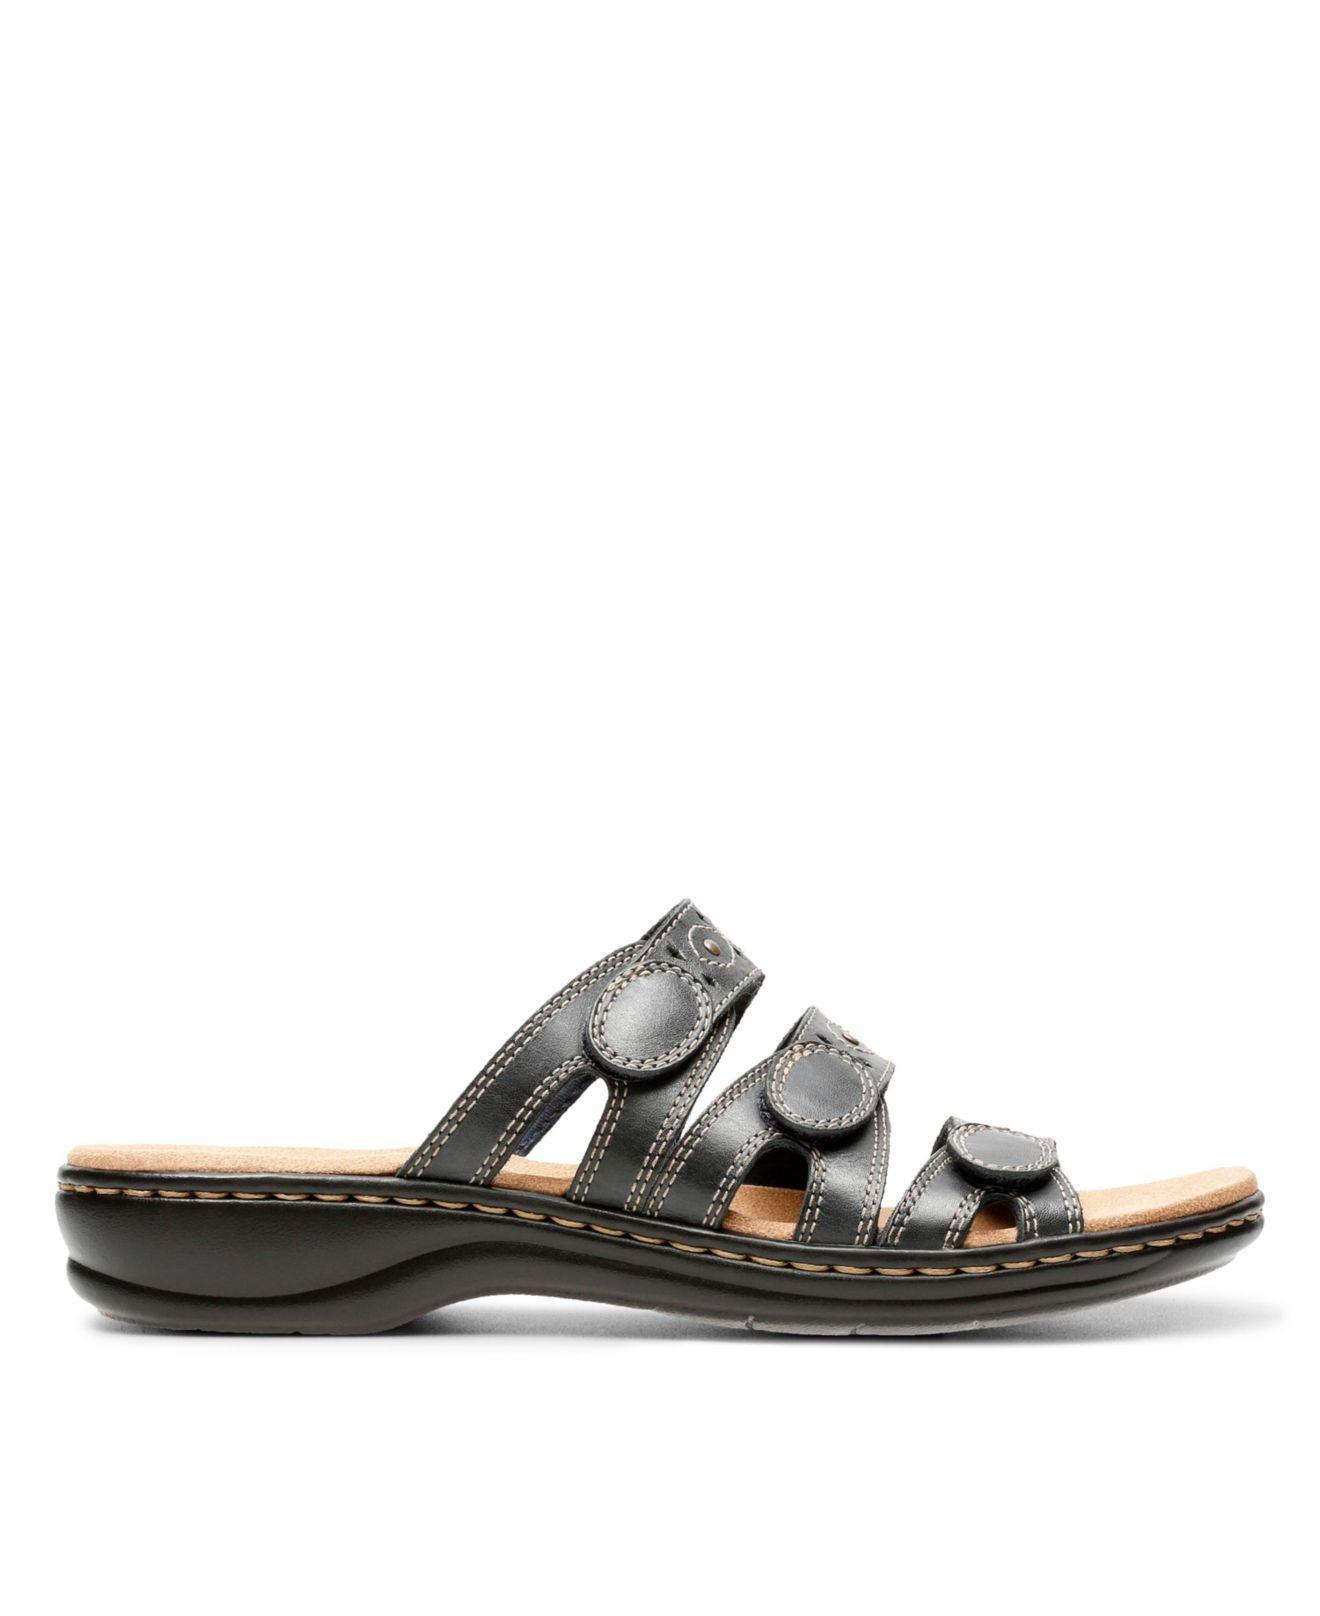 Q Clarks Cacti Sandals Leisa Lyst Flat pqMjULzSVG